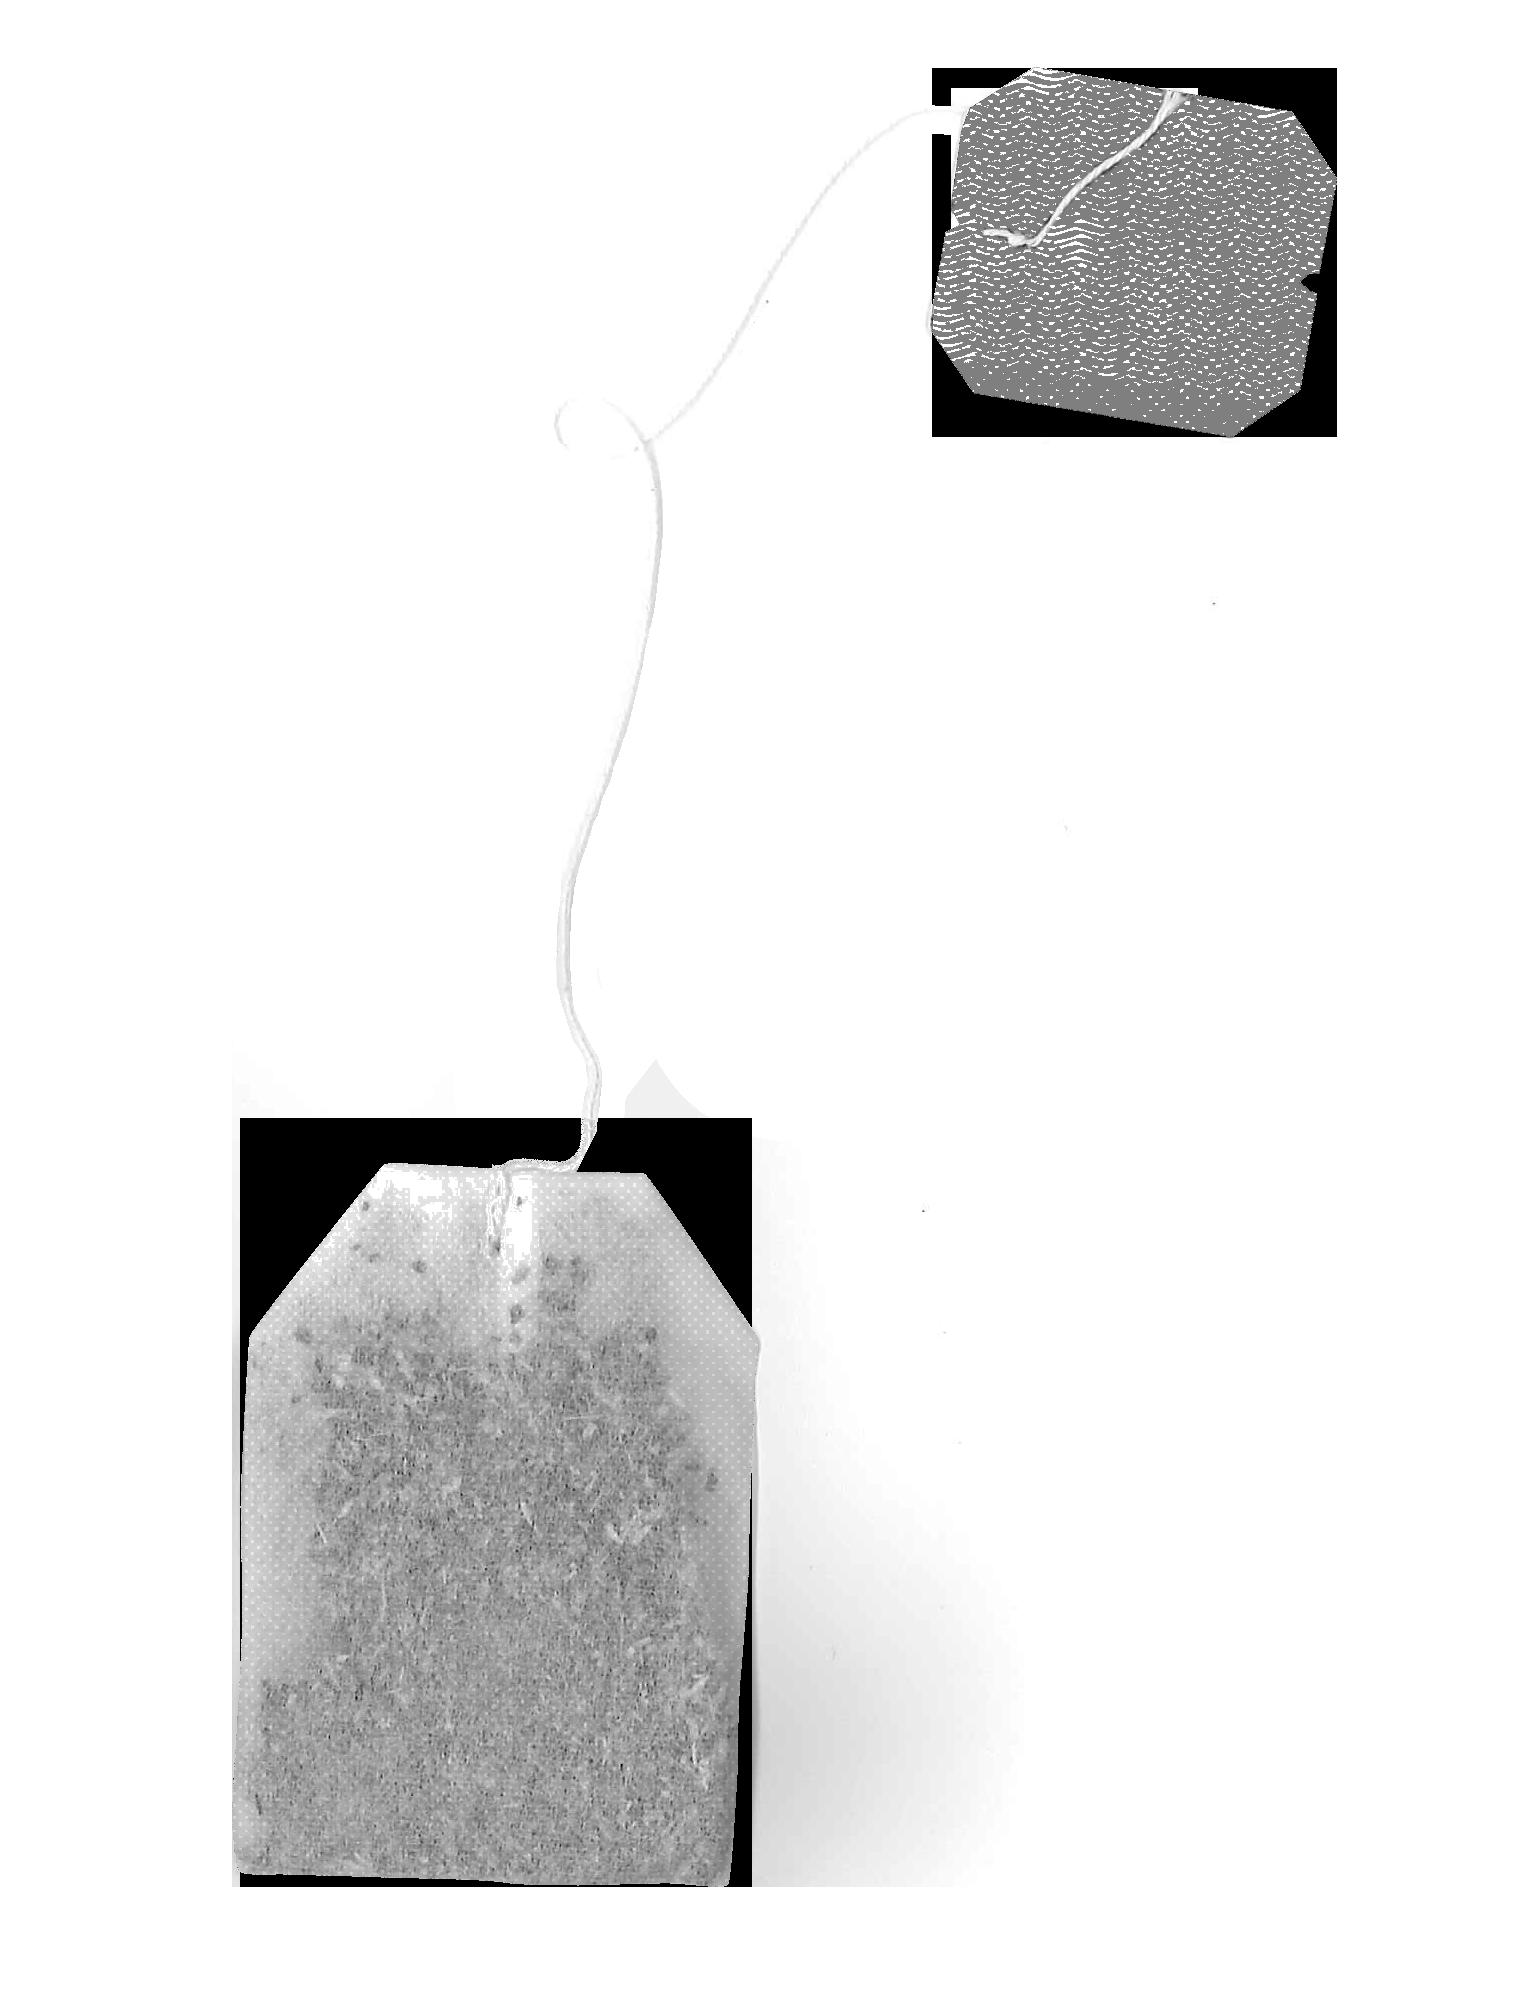 image of a tea bag